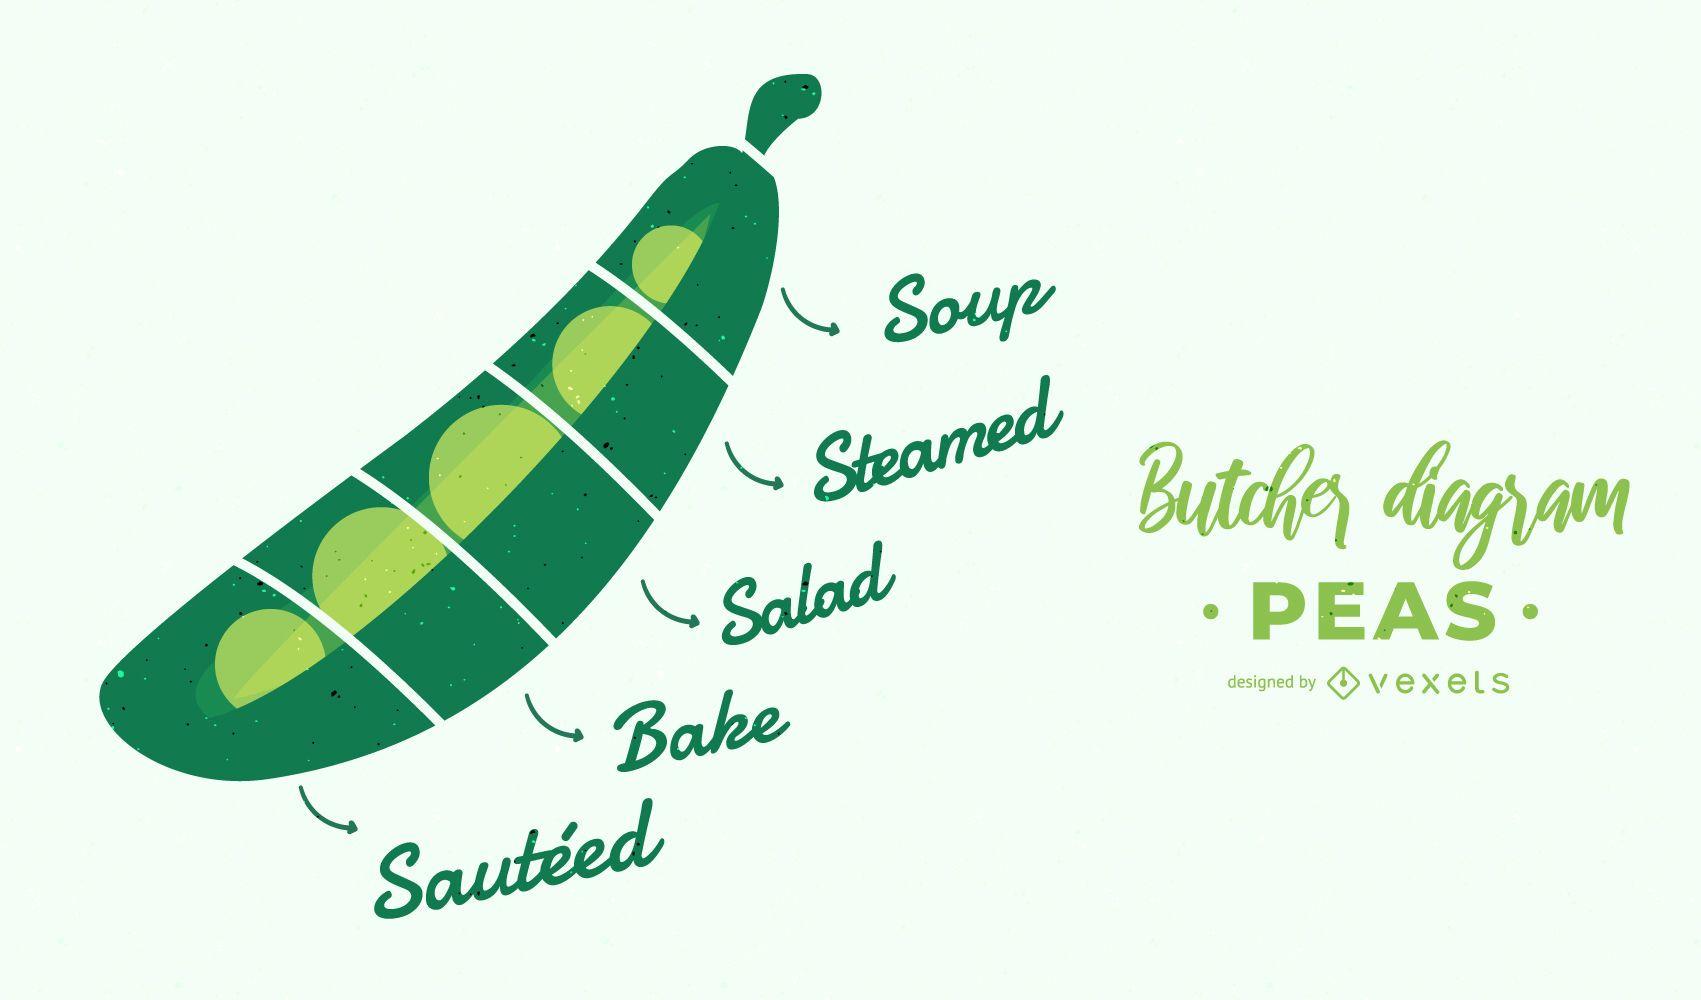 Peas Butcher Diagram Design